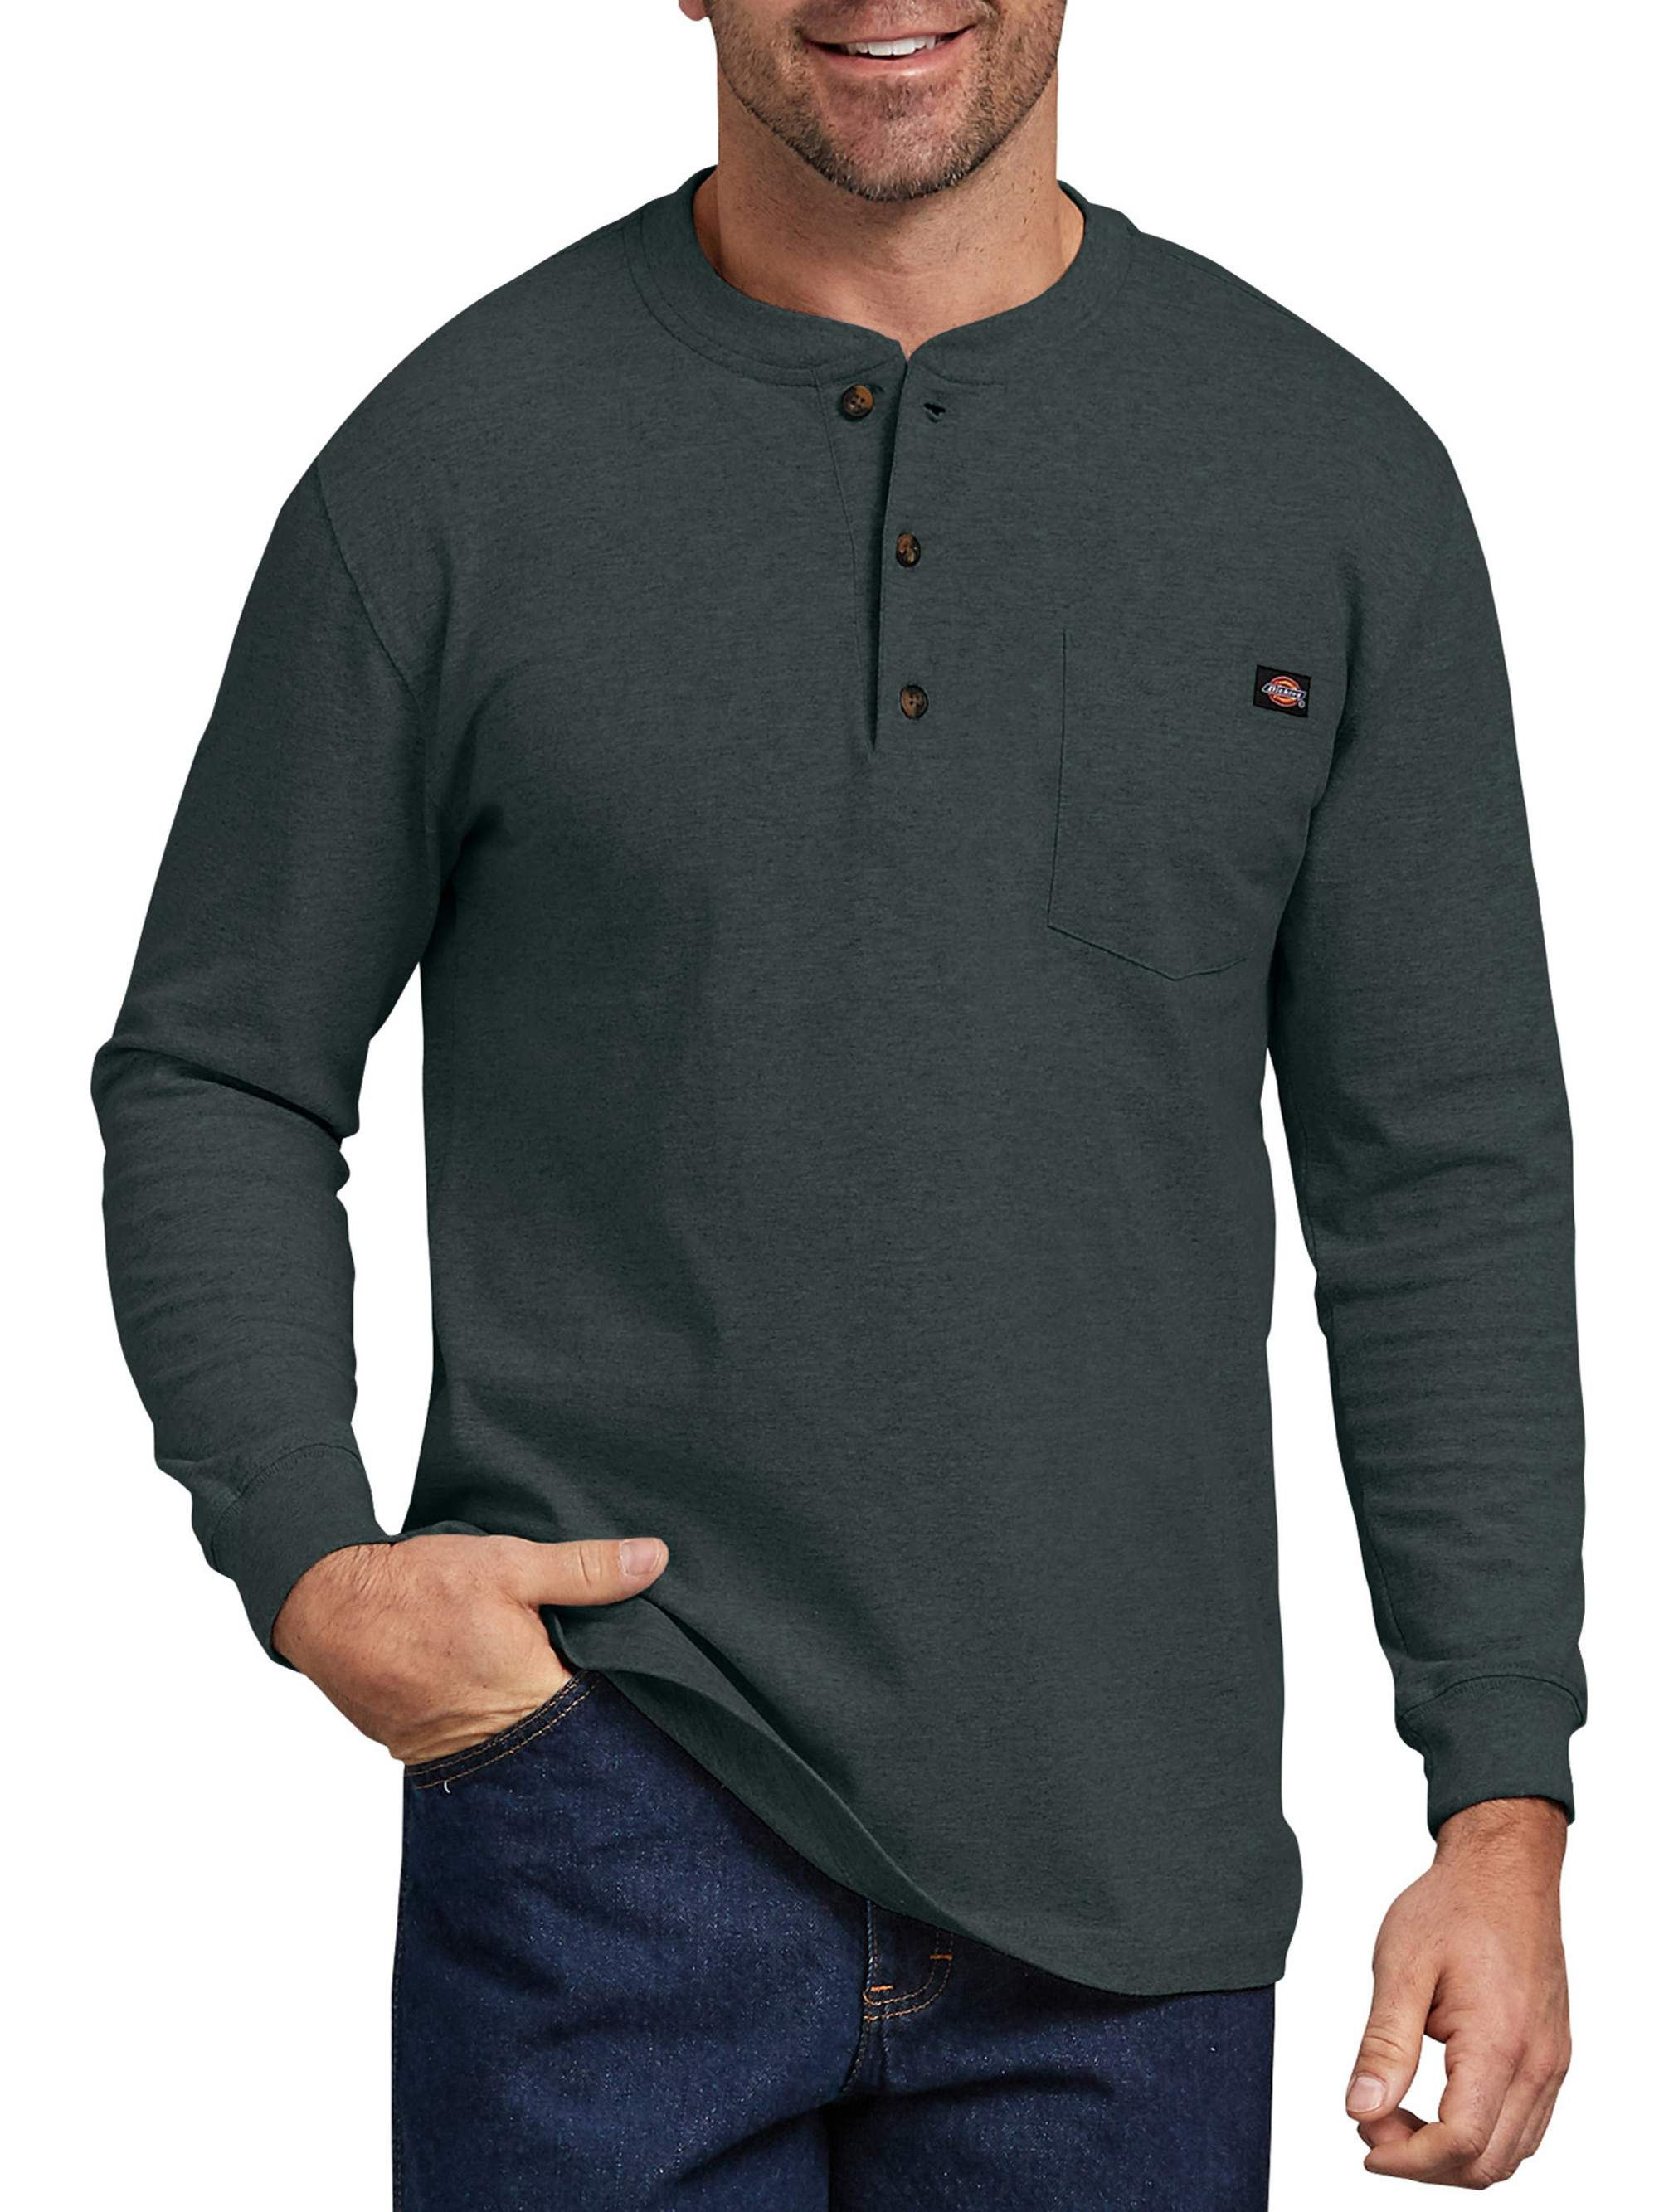 Dickies Mens Technical Wool Thermal Top